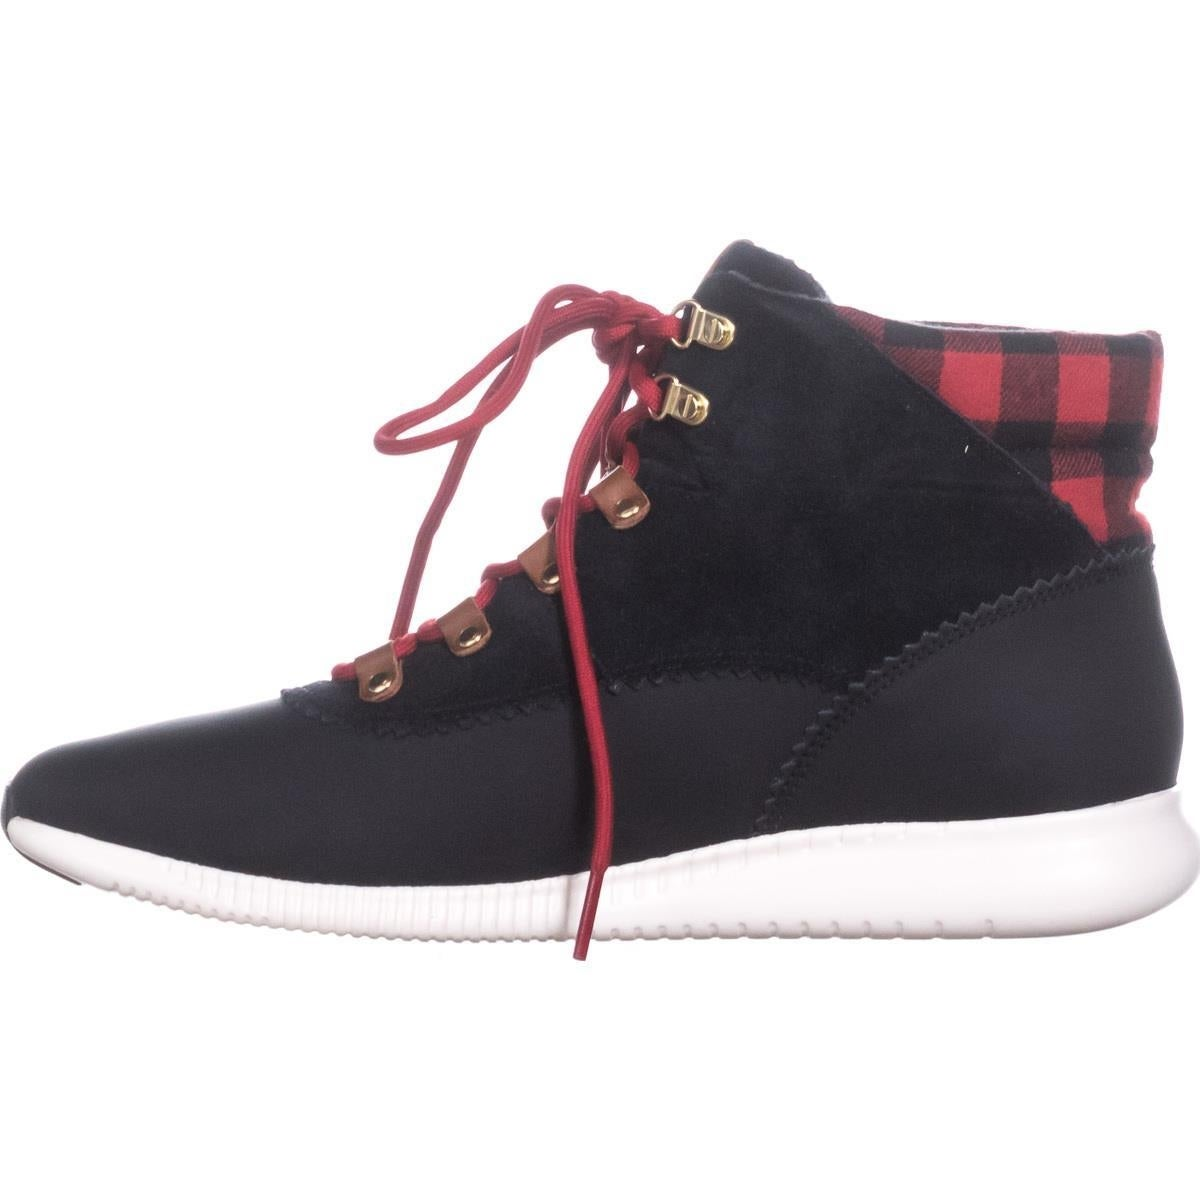 fd14b314d17 Cole Haan 2.0 Zerogrand Lace-Up Hiker Boots, Black/Buffalo Check